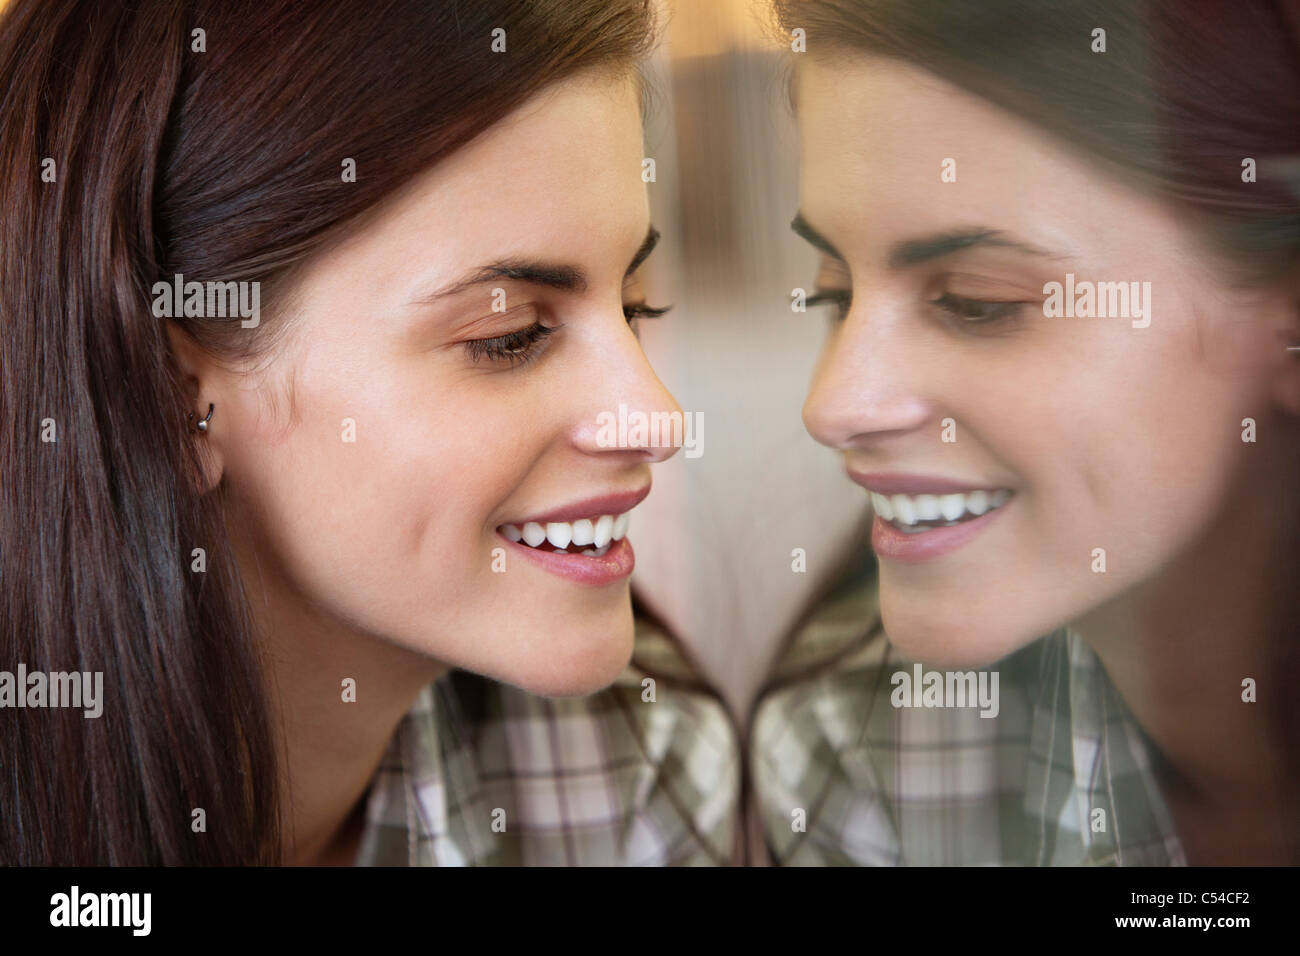 Smiling woman looking at son propre reflet dans le miroir Photo Stock